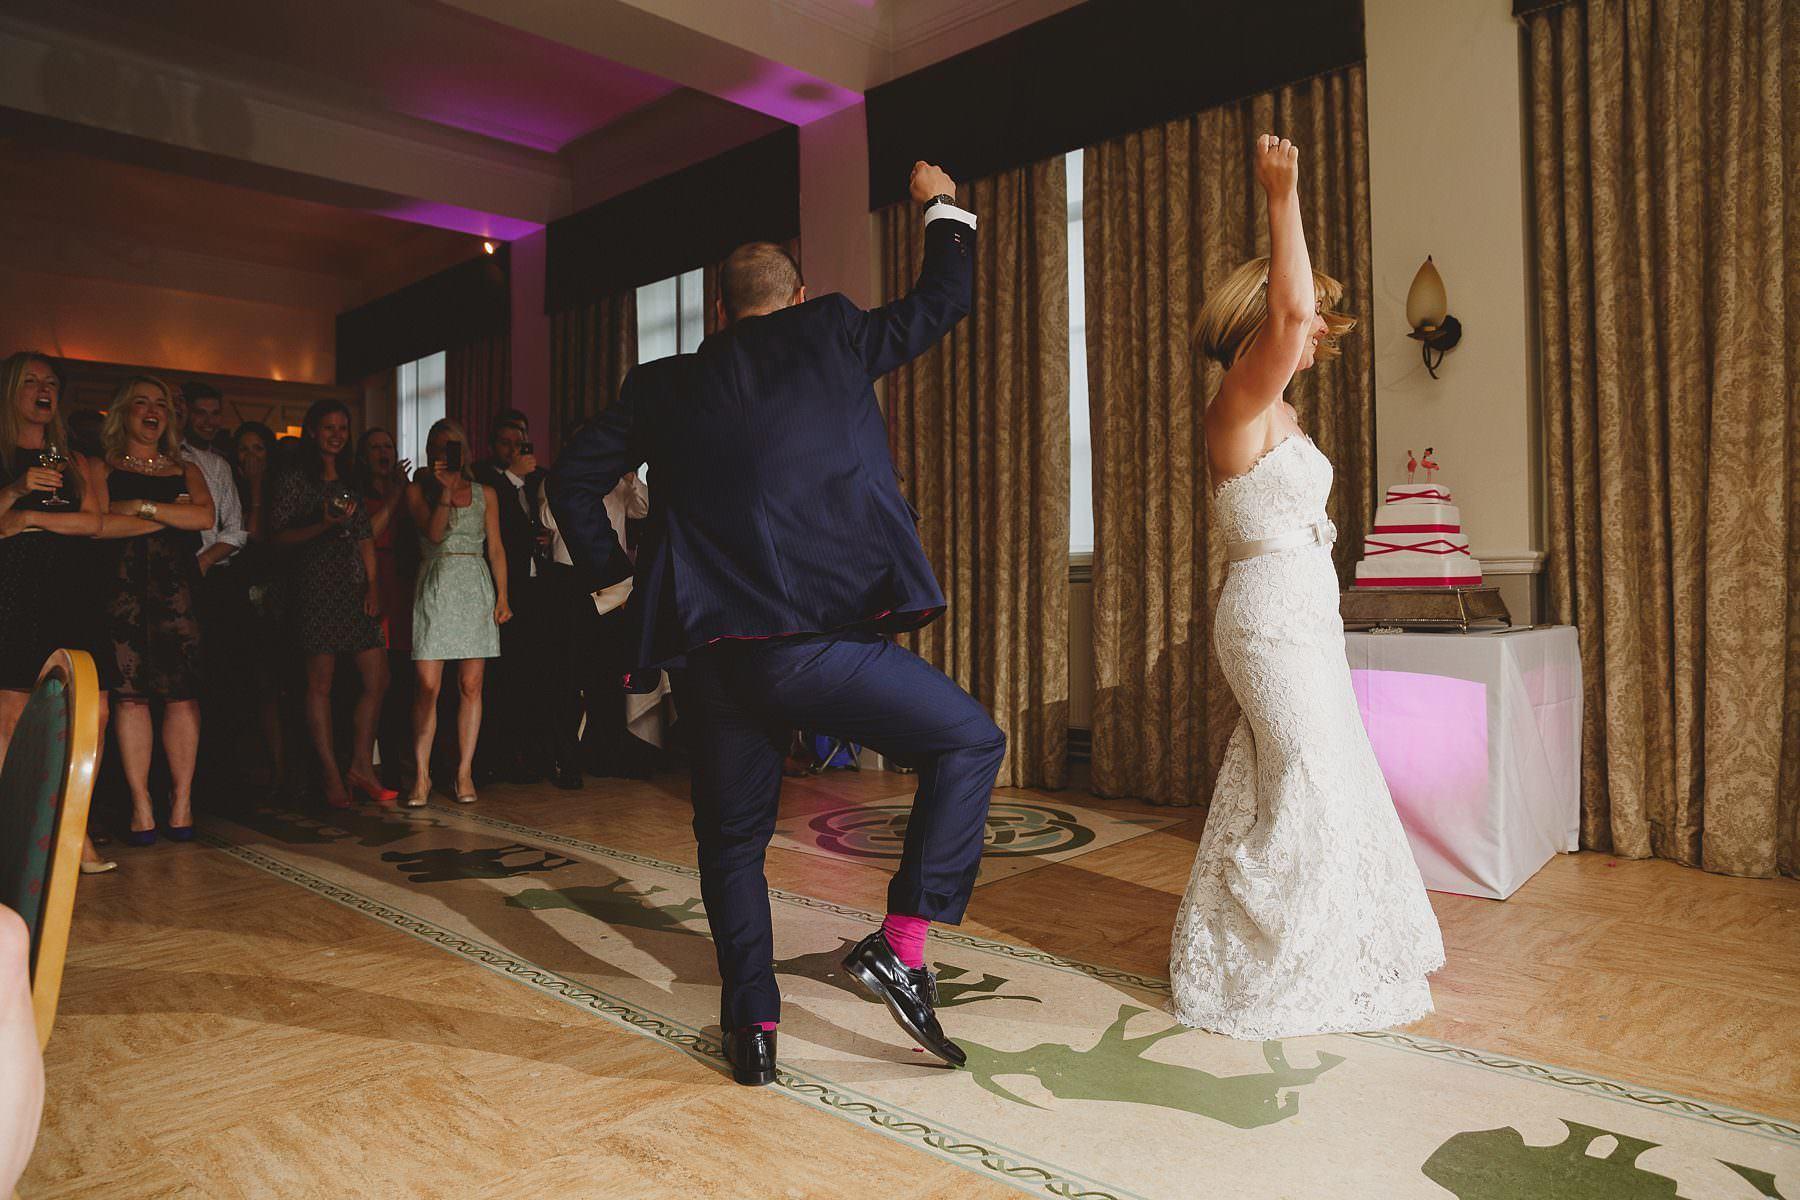 weddings-at-bristol-zoo-052